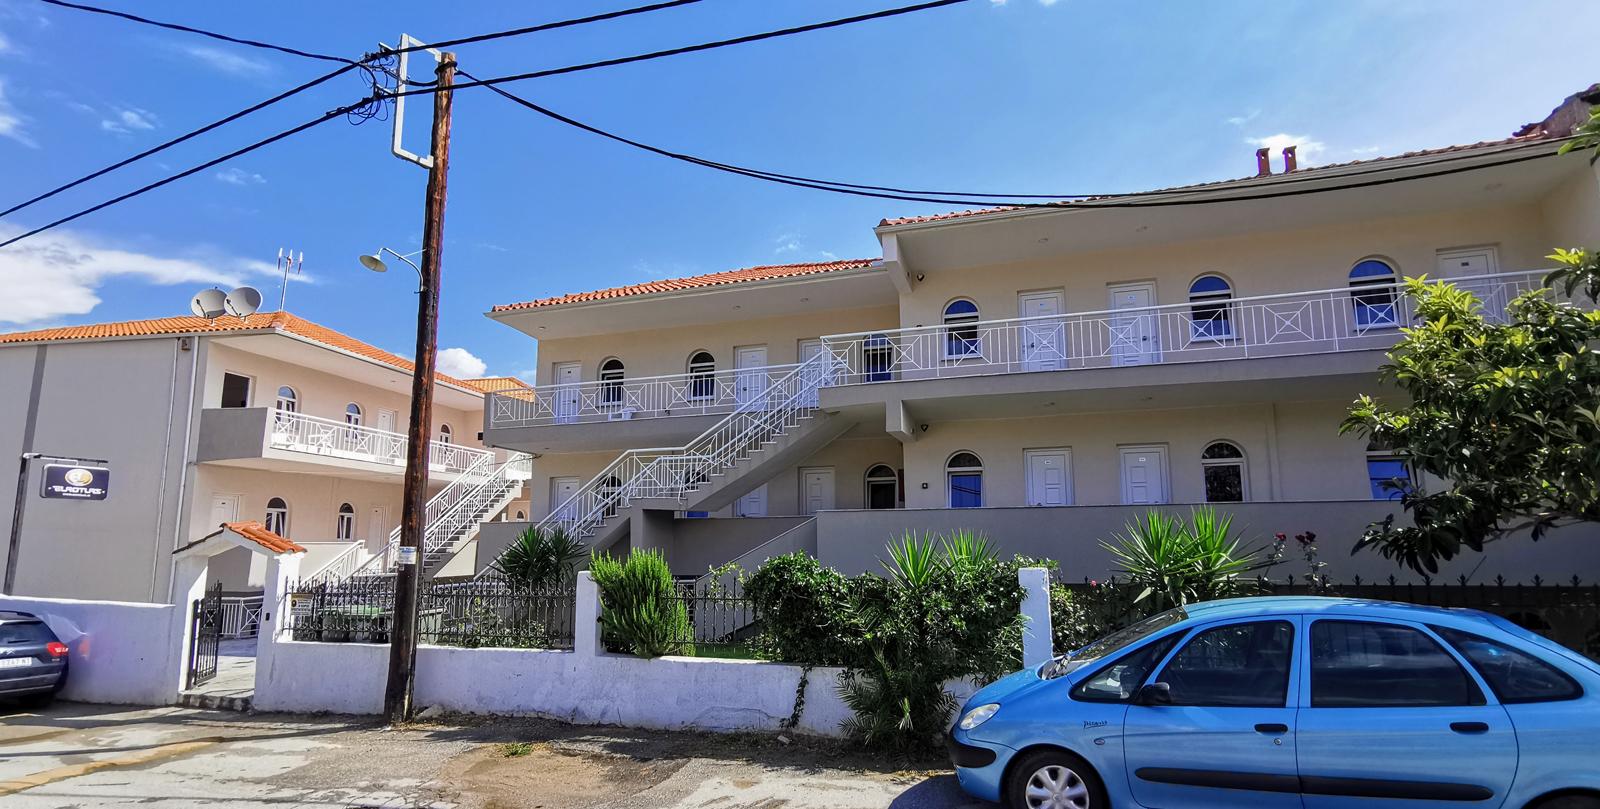 Grcka apartmani letovanje, Polihrono Halkidiki, Green Gardens,, kuća B, dvorište prema ulici i deo kuće A bočno